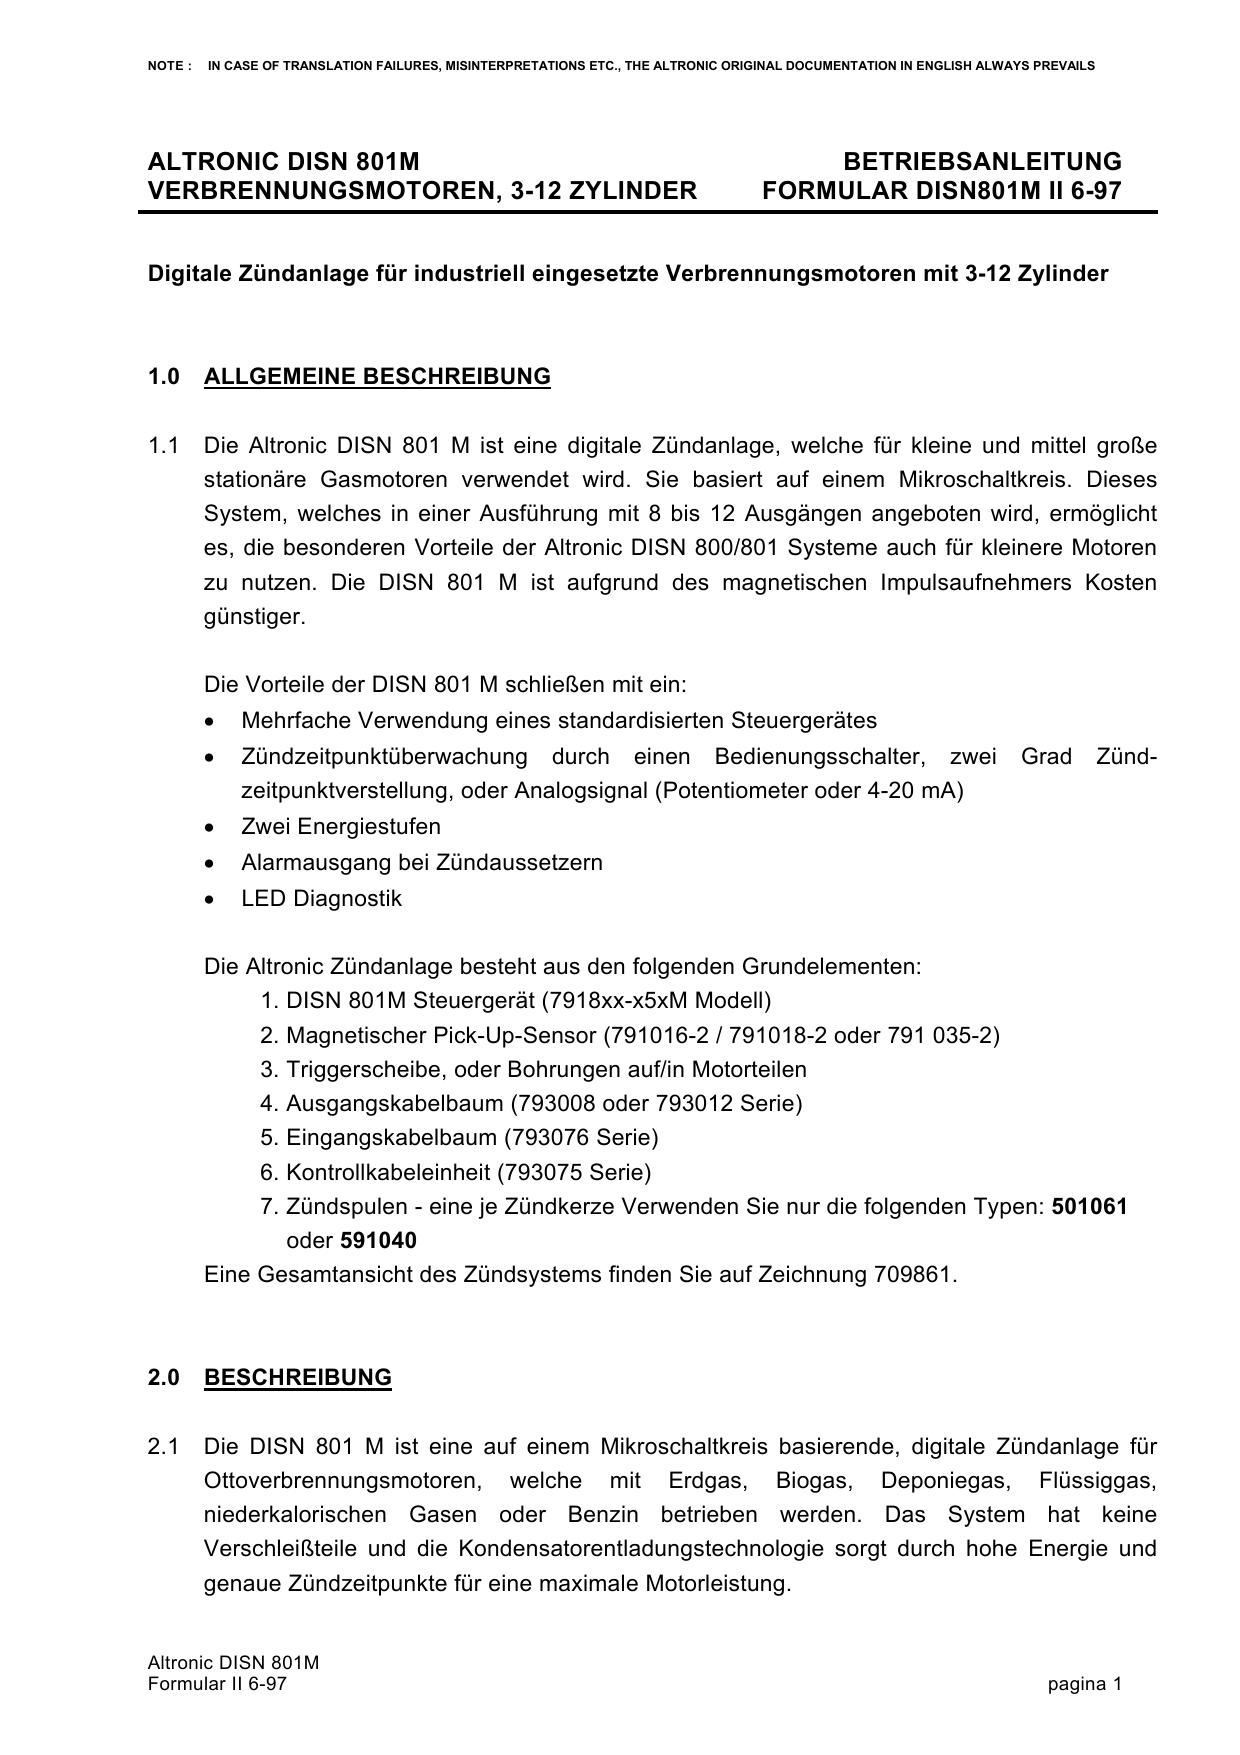 Altronic DISN 801 M - BHKW | manualzz.com